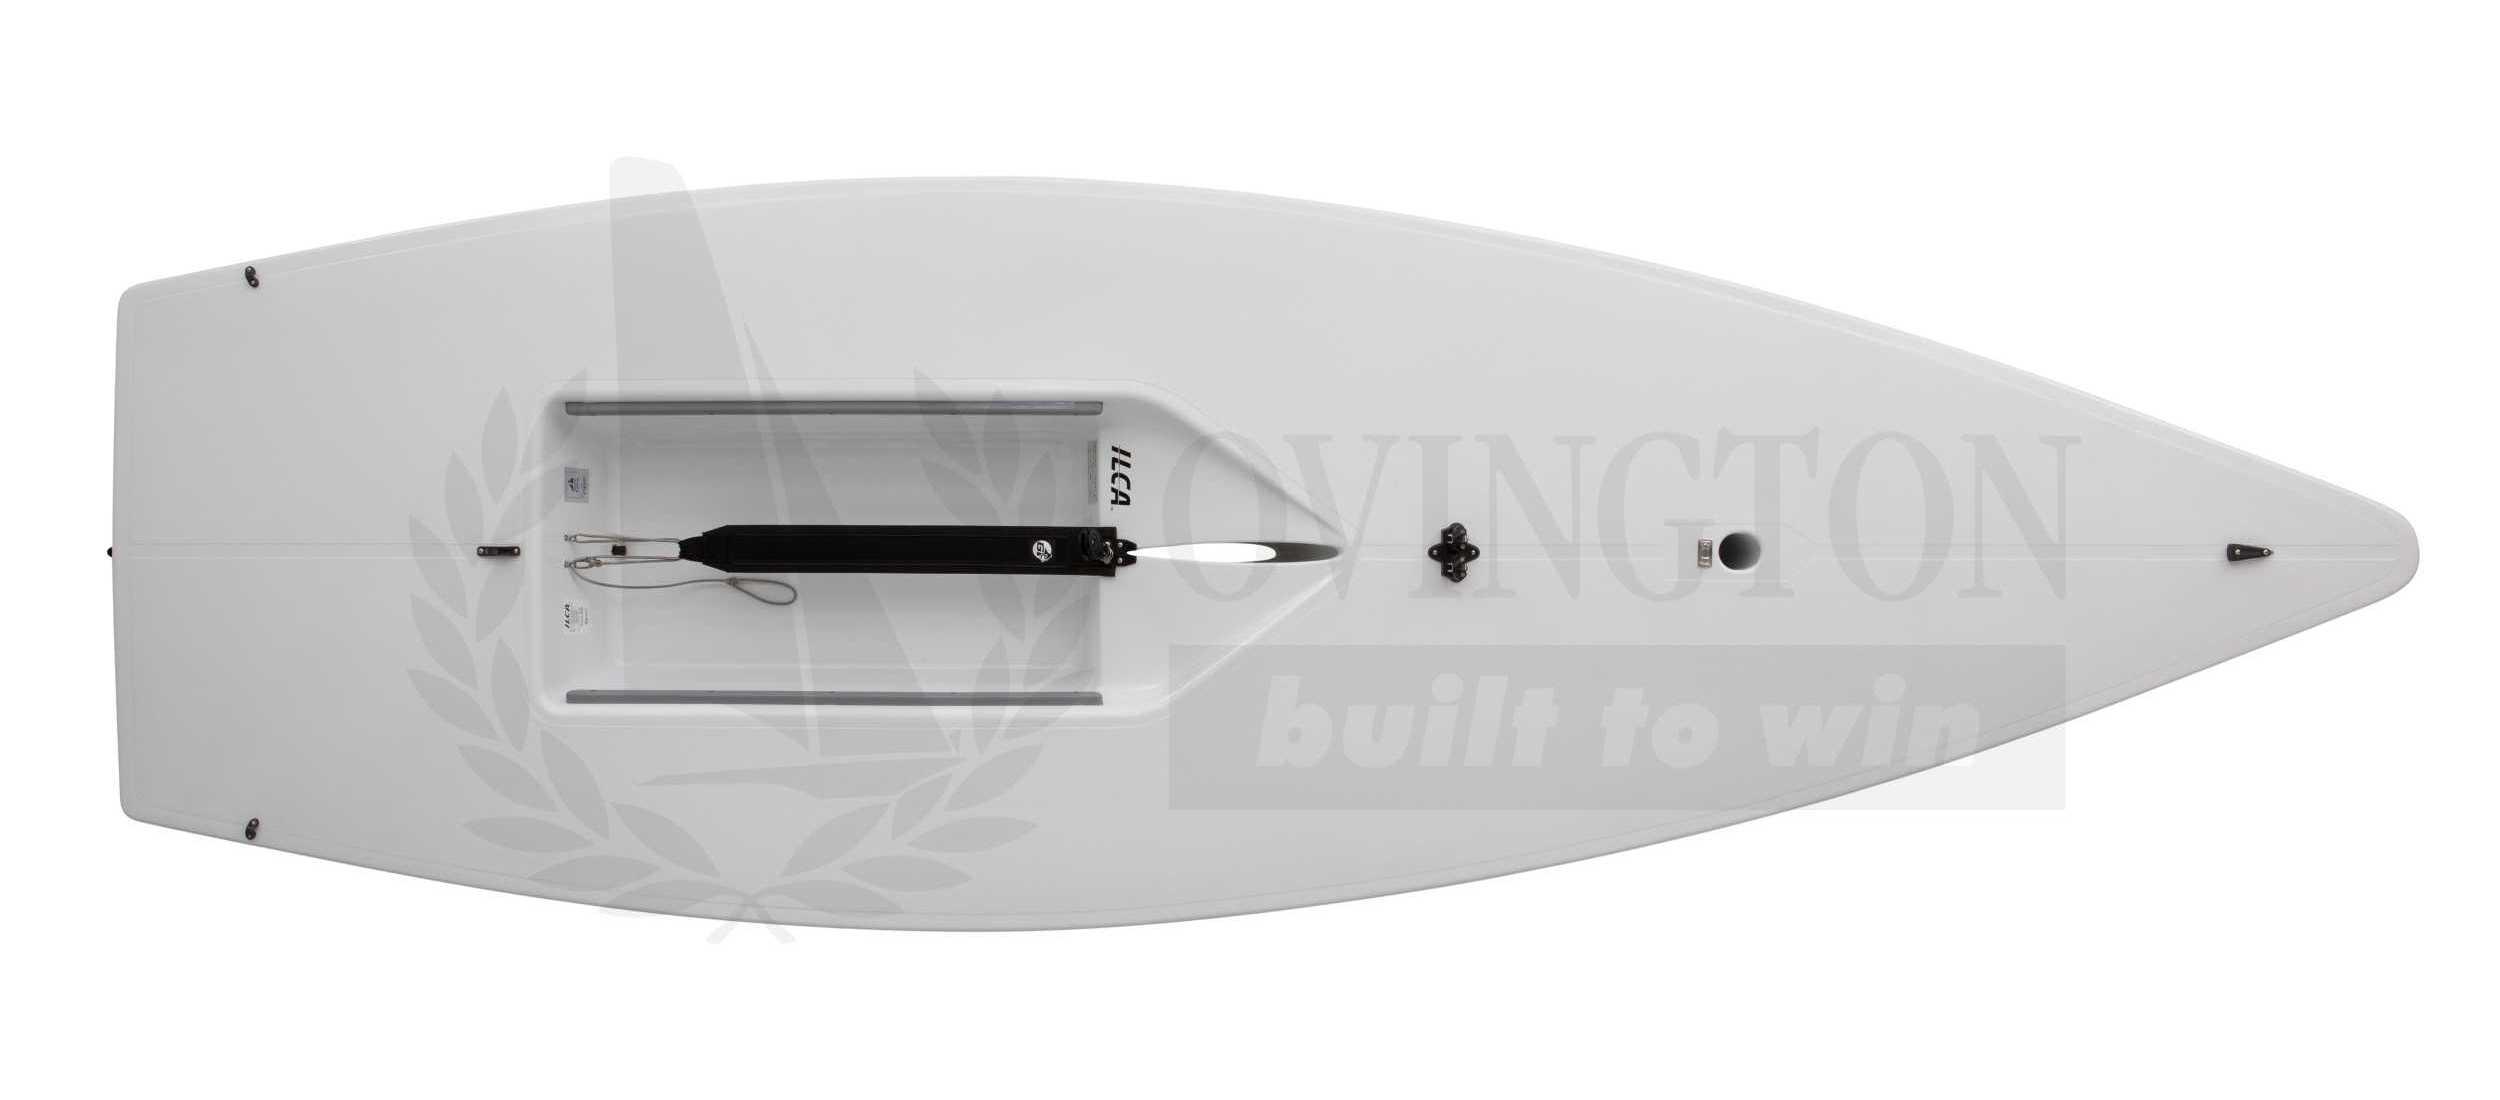 ovington-ilca-hull-white-3-2500-1100.jpg